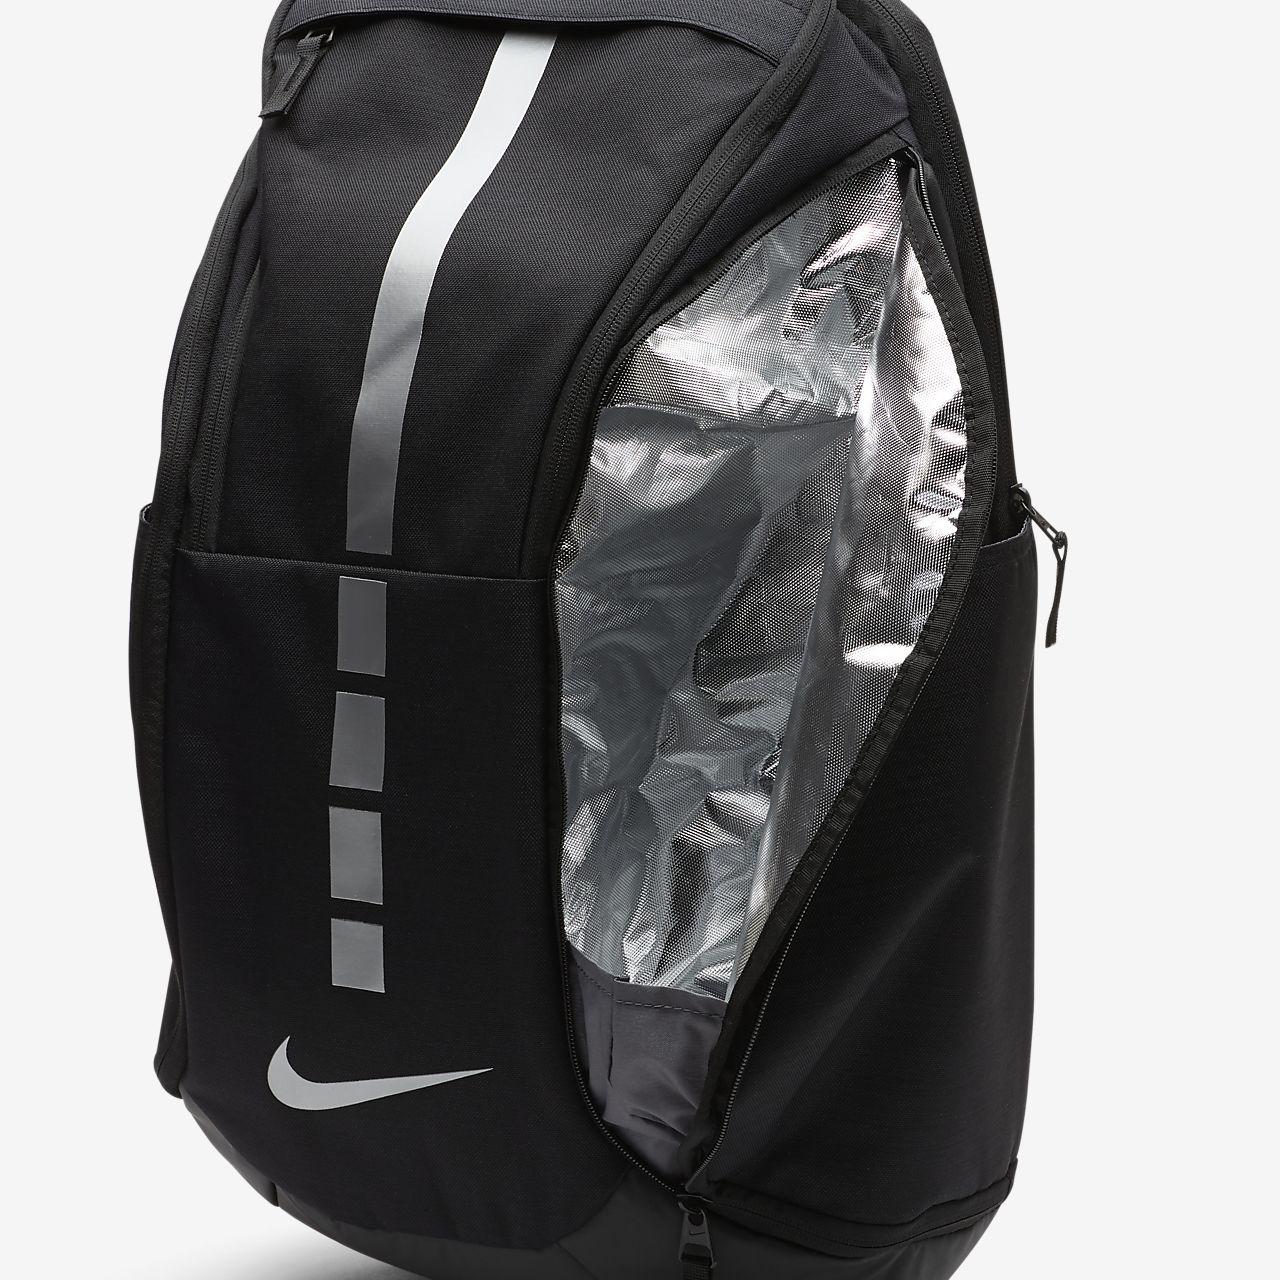 a5144f80ea8 Nike Hoops Elite Pro Basketball Backpack. Nike.com AU